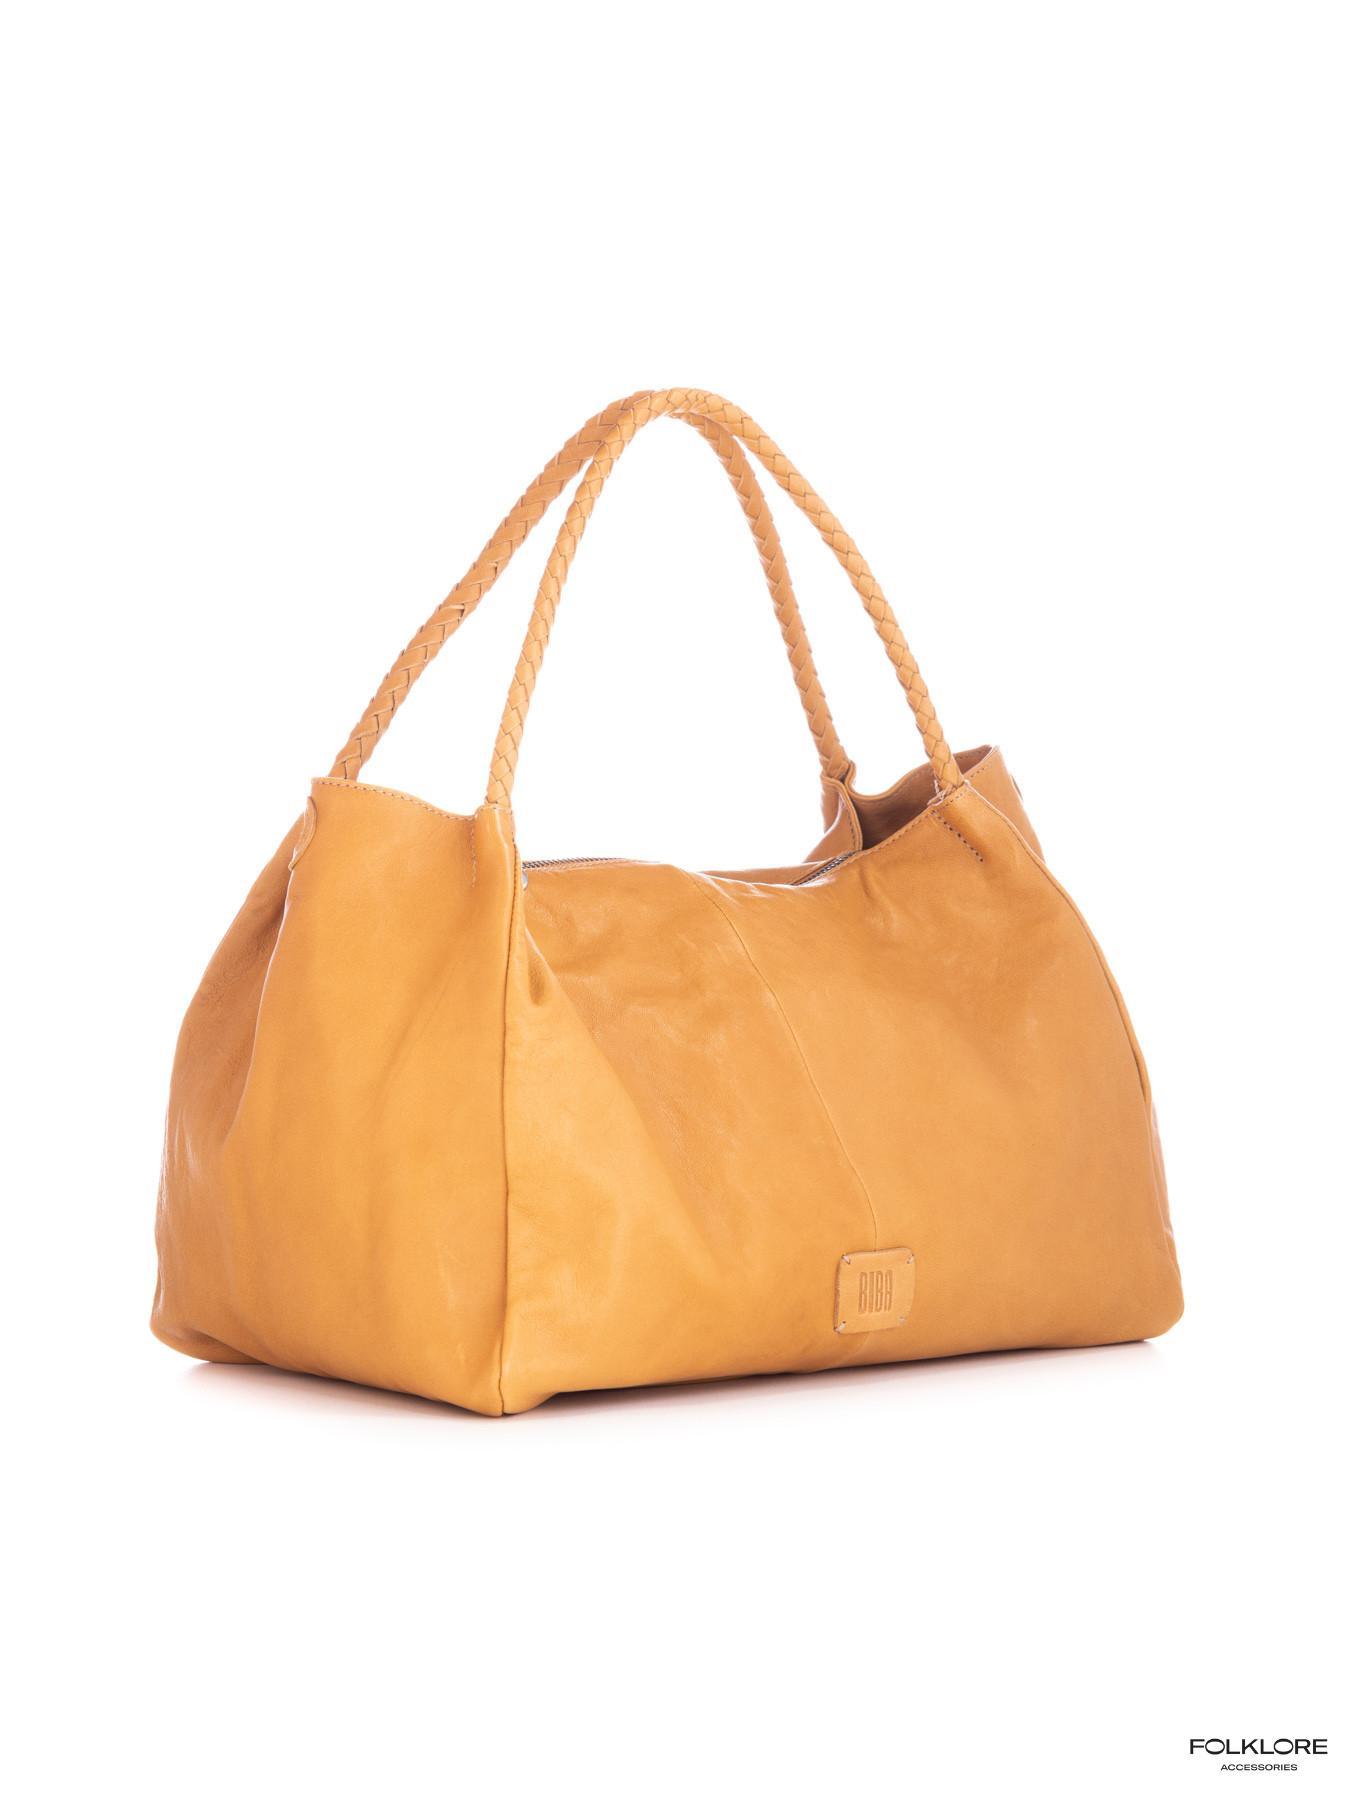 BIBA Avon Žuta kožna tašna sa pletenim ručkama